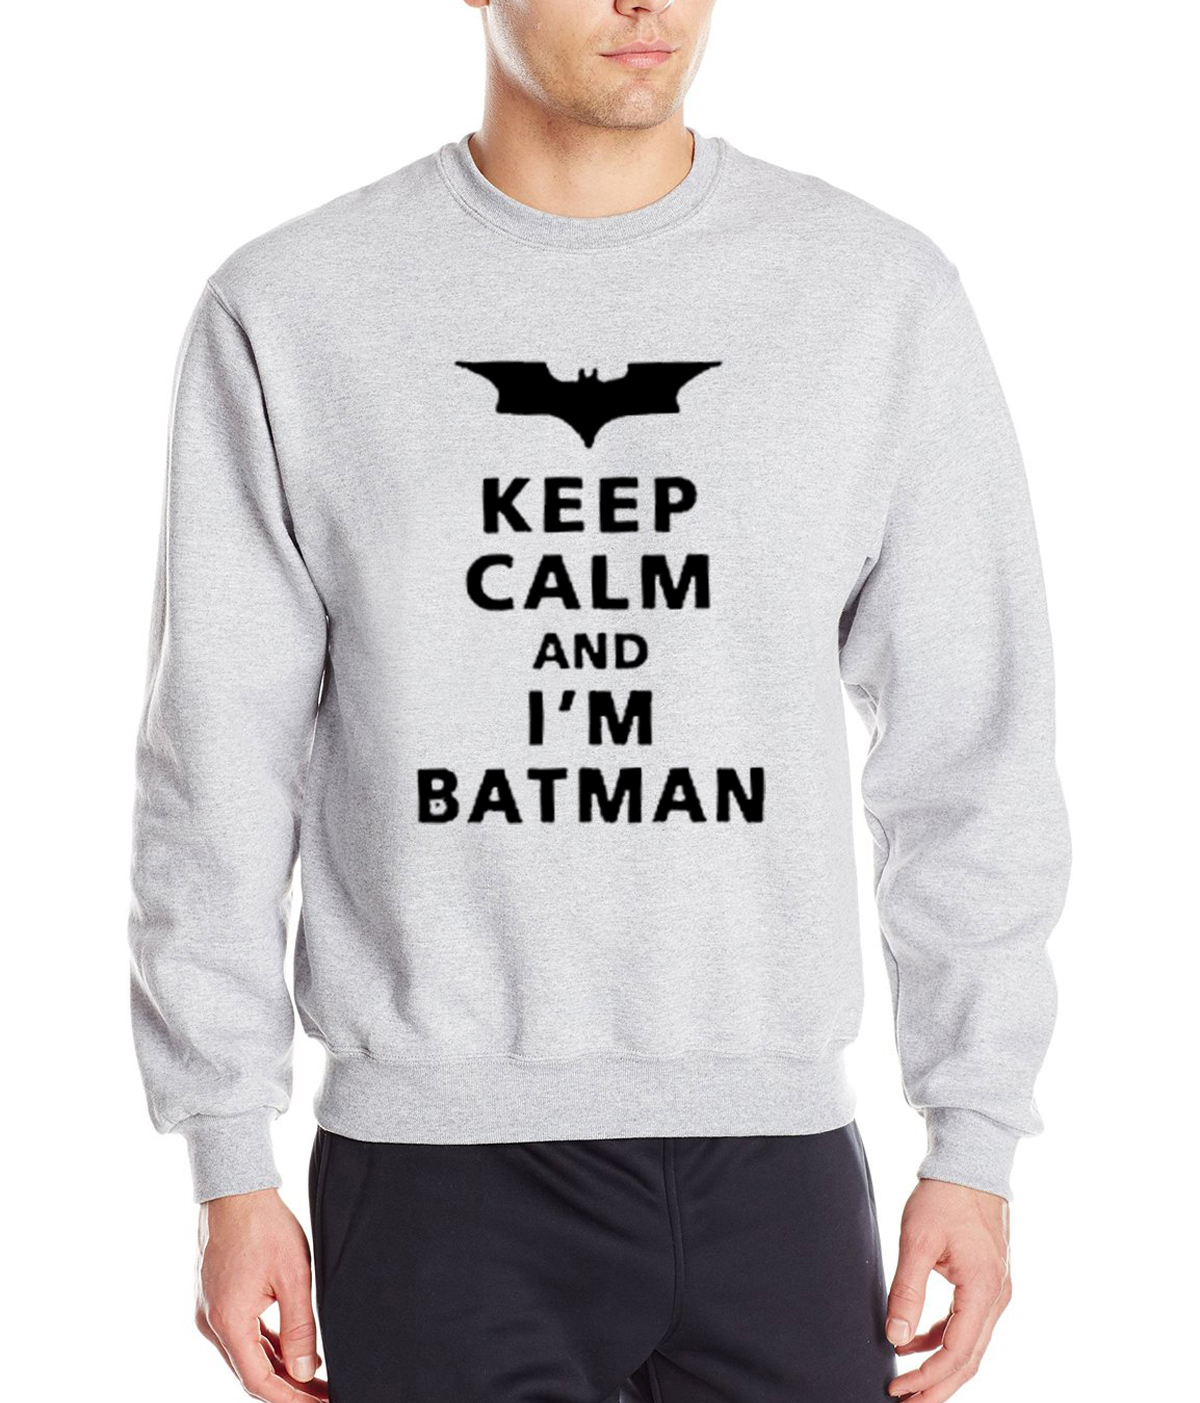 Superman Batman sweatshirt 2019 hot sale spring winter Keep Calm I Am  Batman hoodies hip hop tracksuit fleece brand clothing